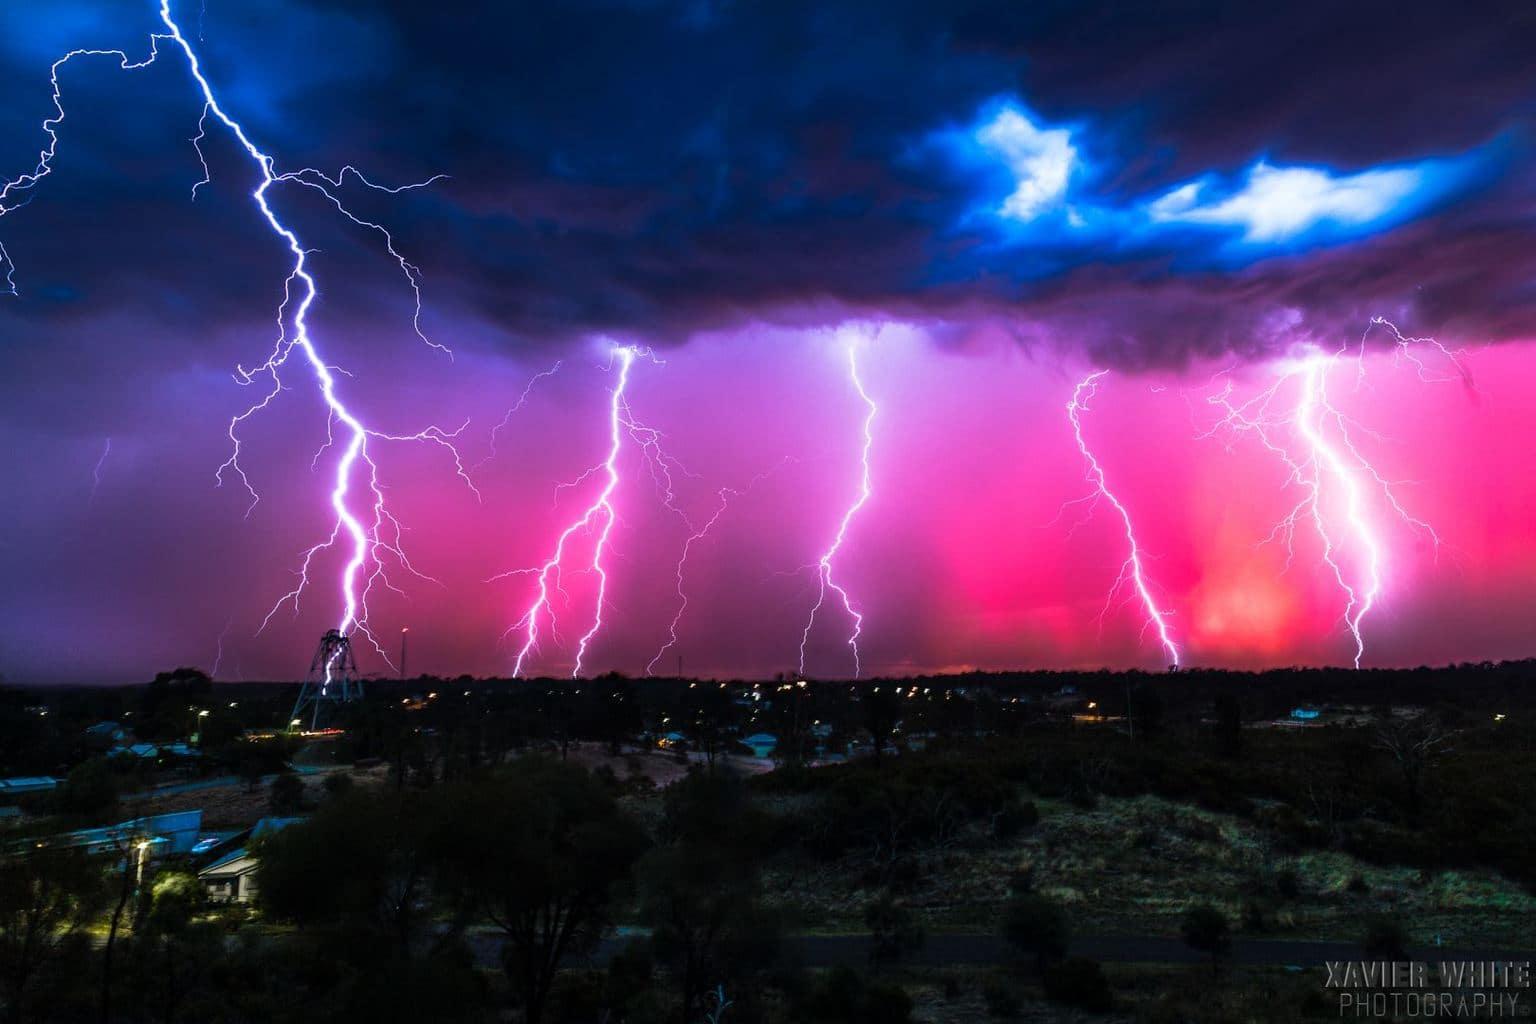 Lightning Sunset' Canon 6D | Canon 24 - 105L | 24mm | ISO 50 | F8 | 30 sec | Bendigo, Victoria Australia | 15.2.15